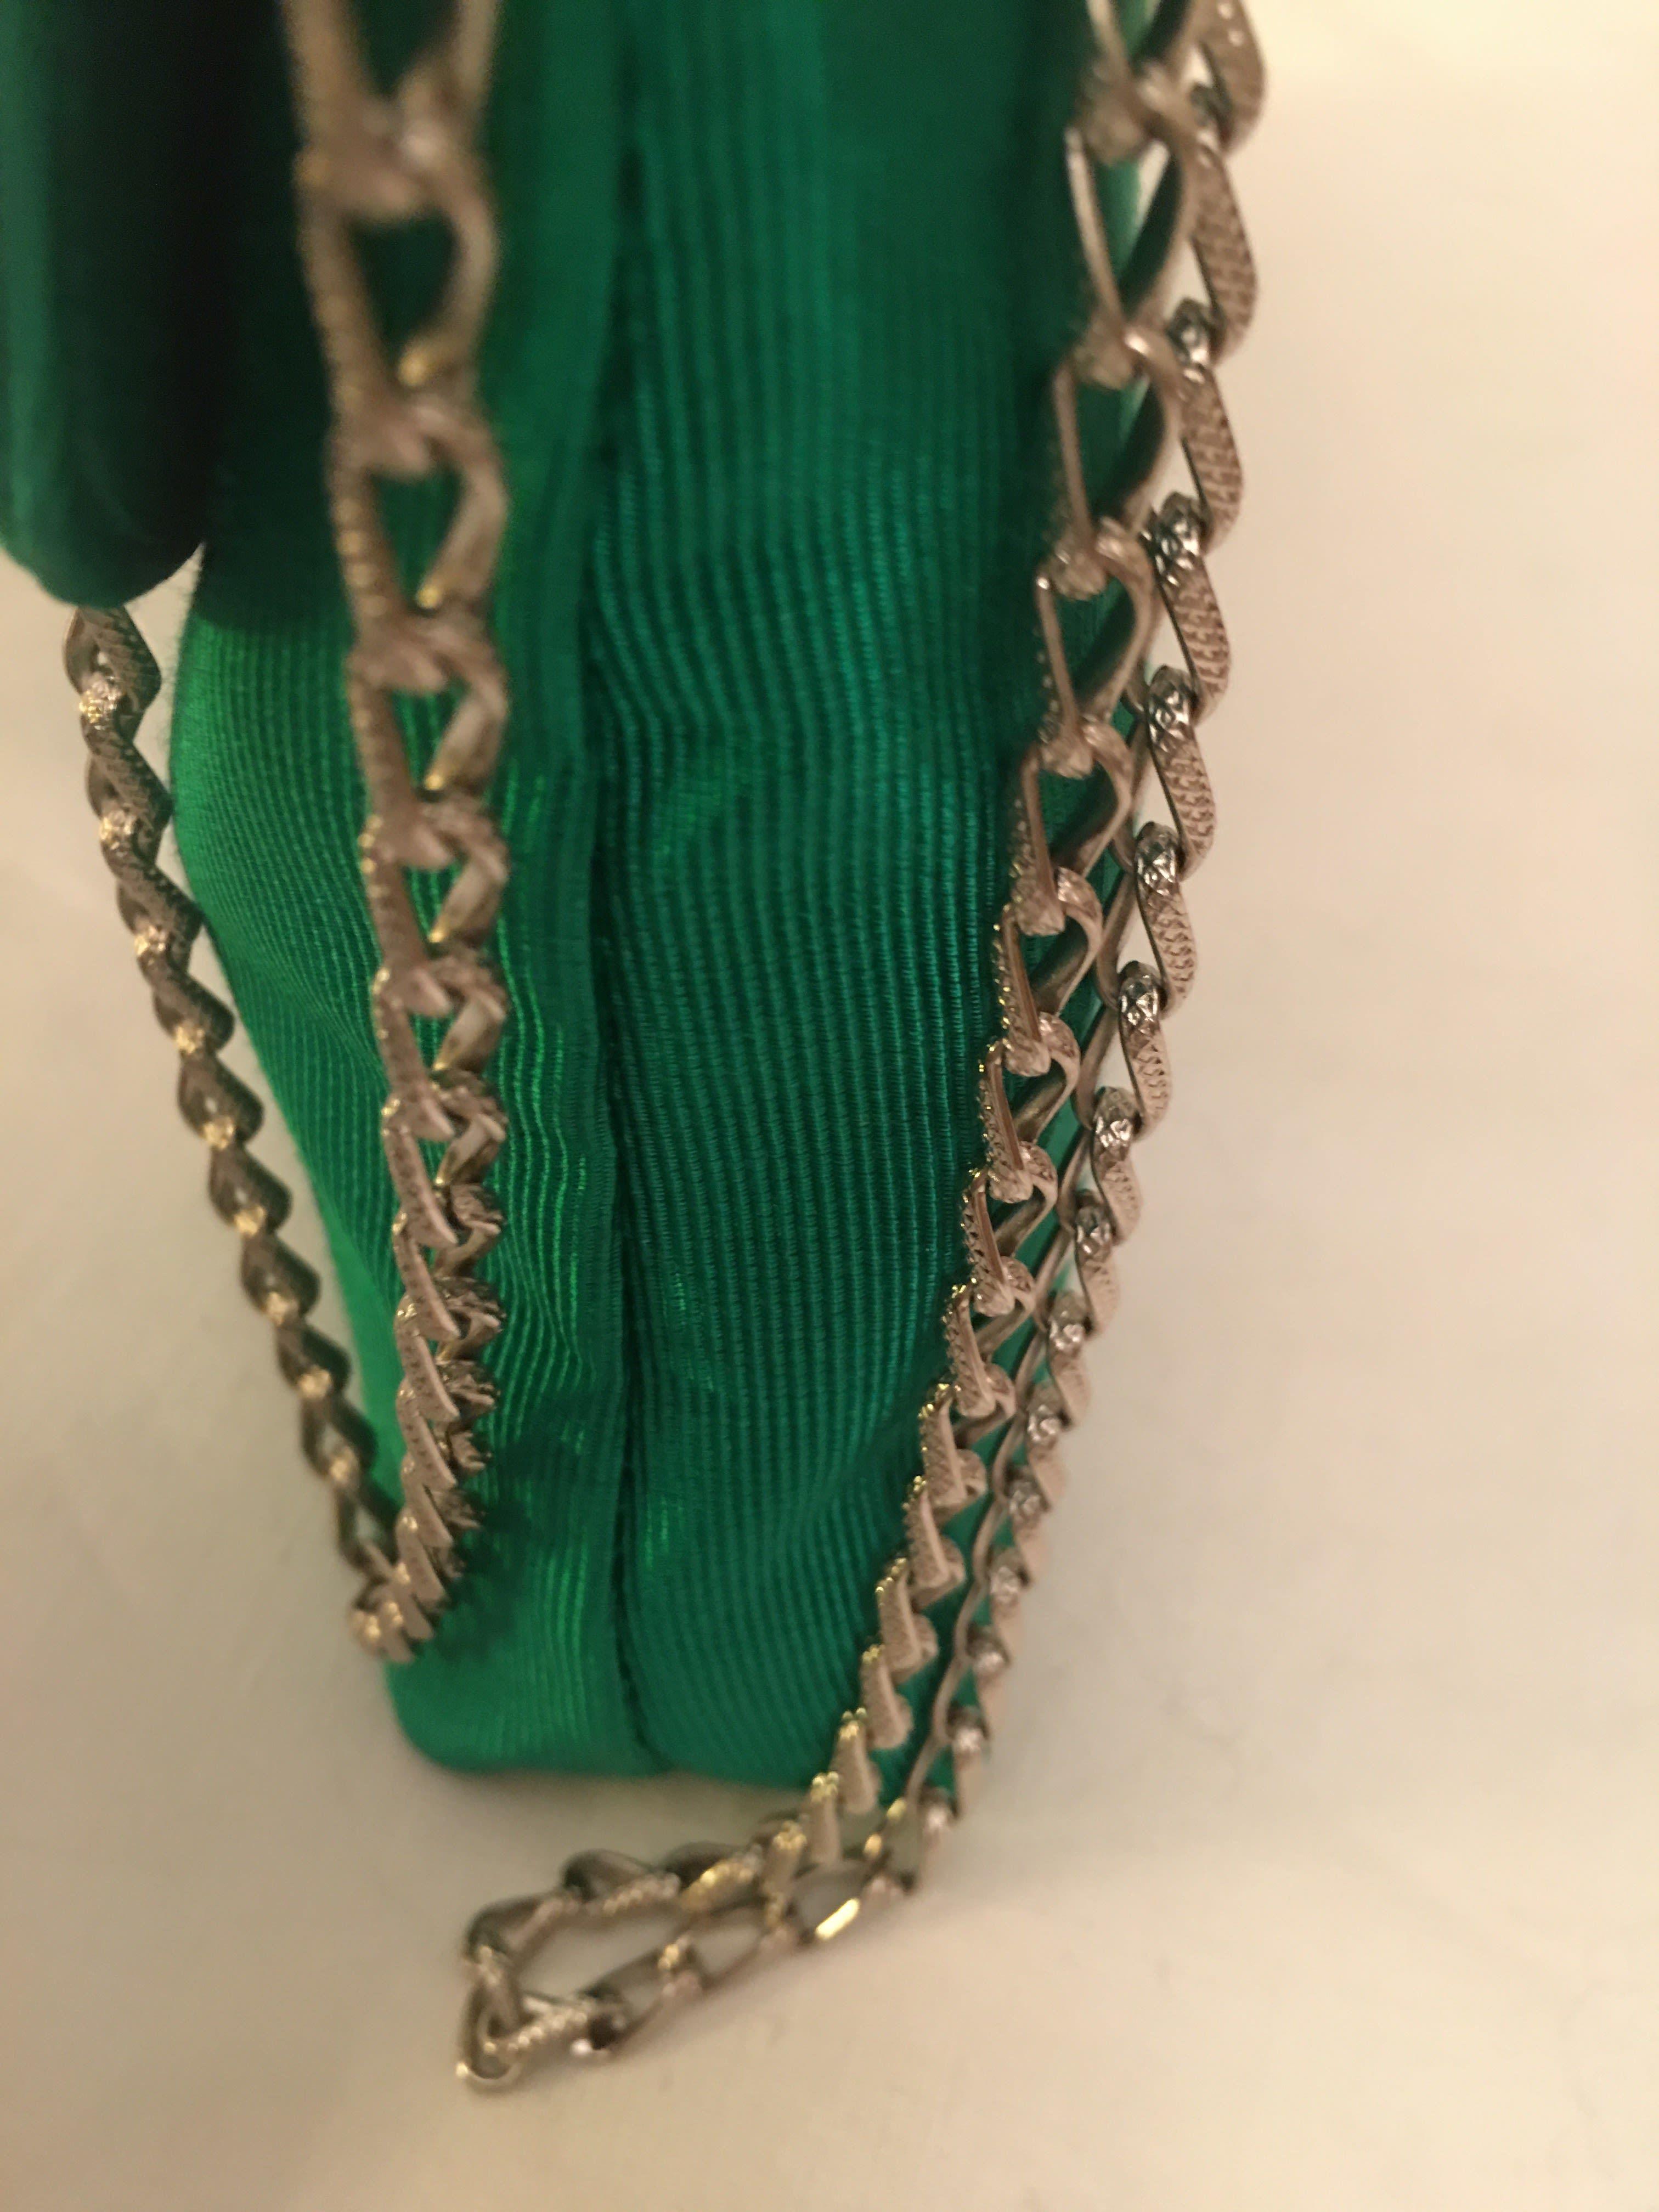 Accessoires - Sac noeud